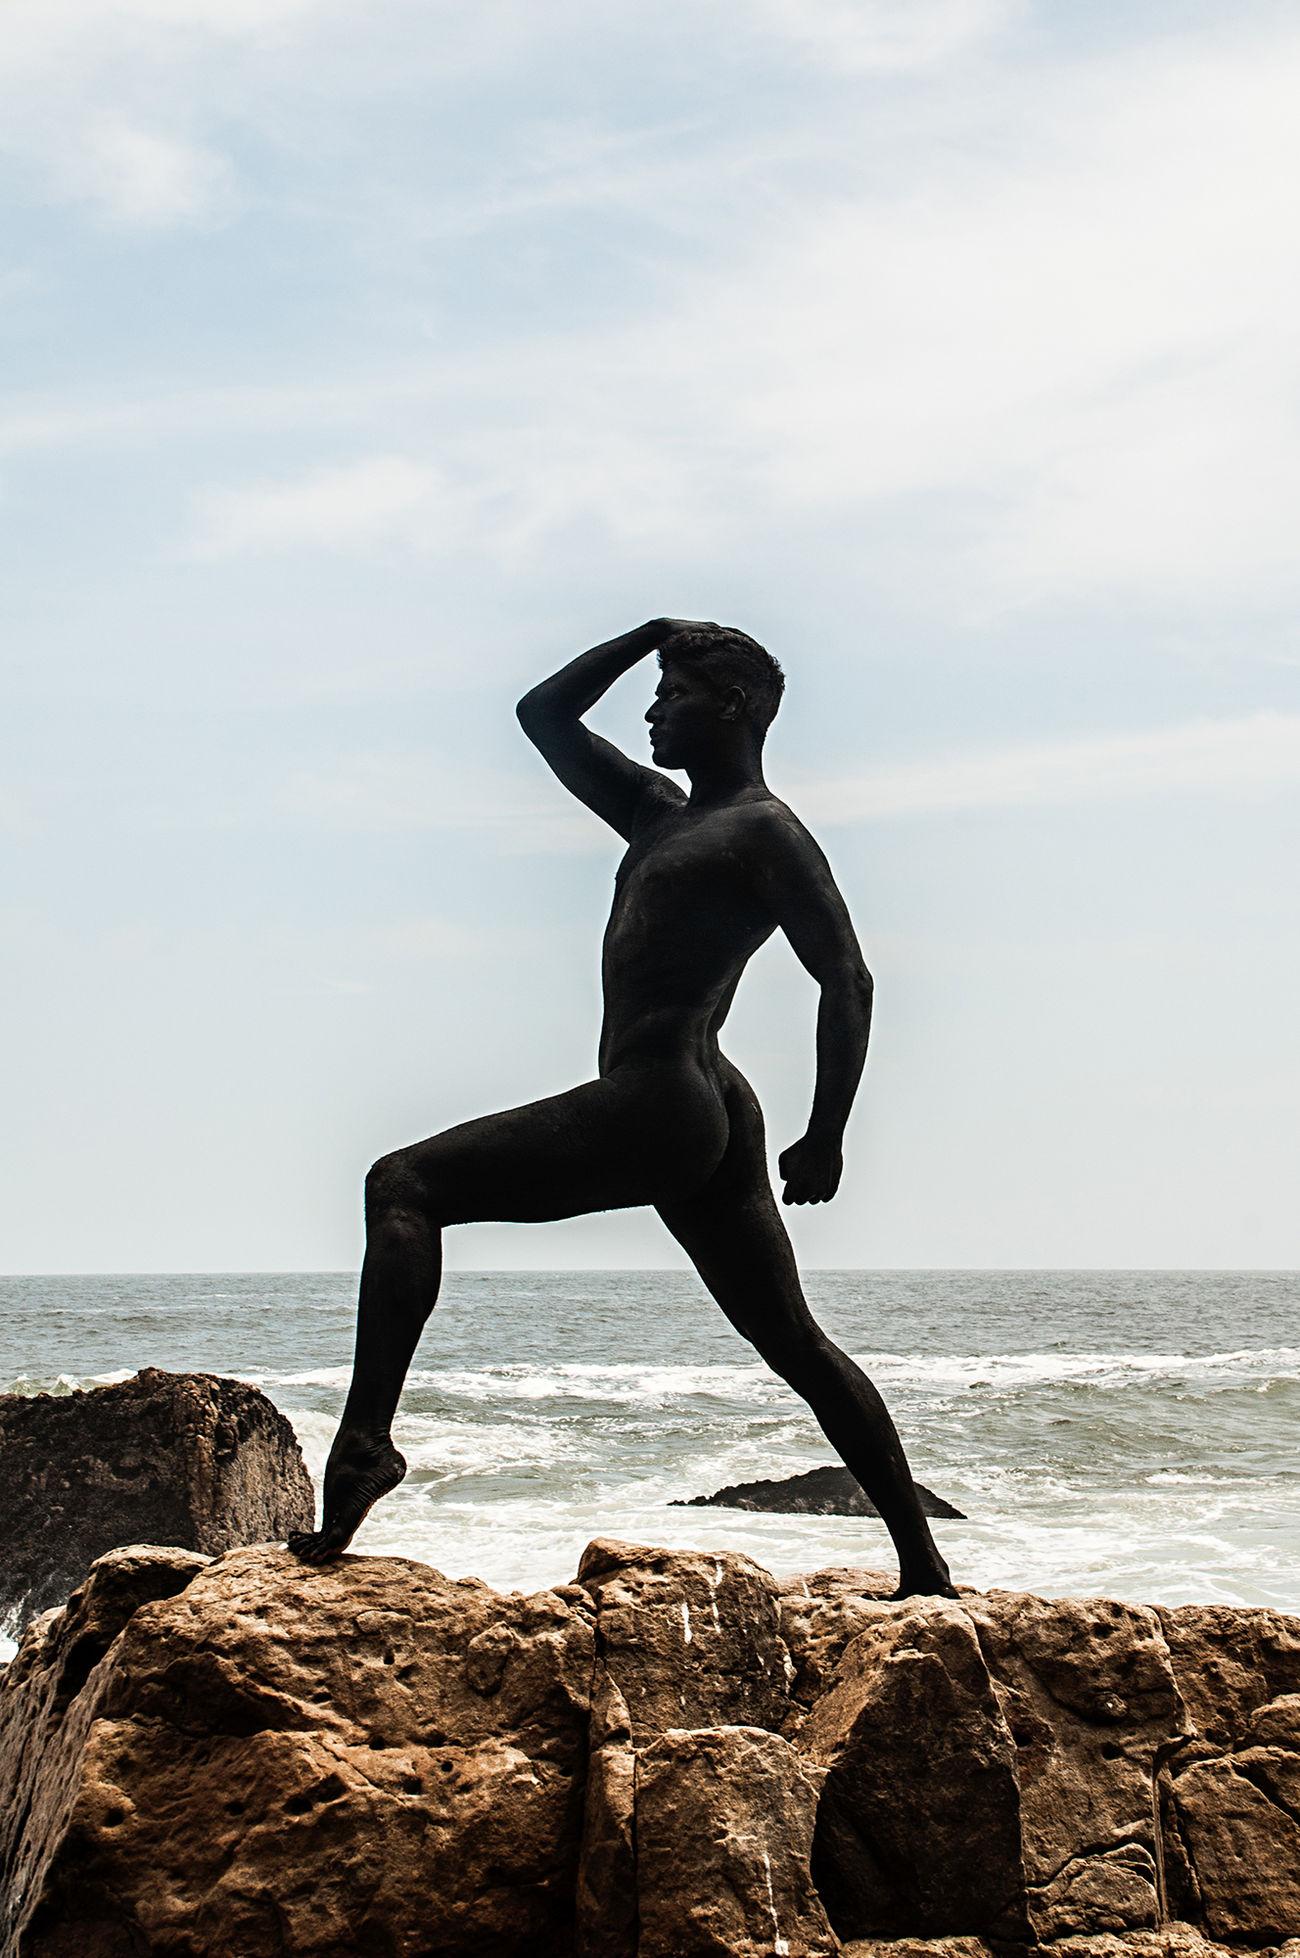 Sculptural portrait of a dancer Beach Beauty In Nature Bodypaint Dancer Horizon Over Water Men Nature One Person Outdoors People Rock - Object Sculpture Sea The Portraitist - 2017 EyeEm Awards